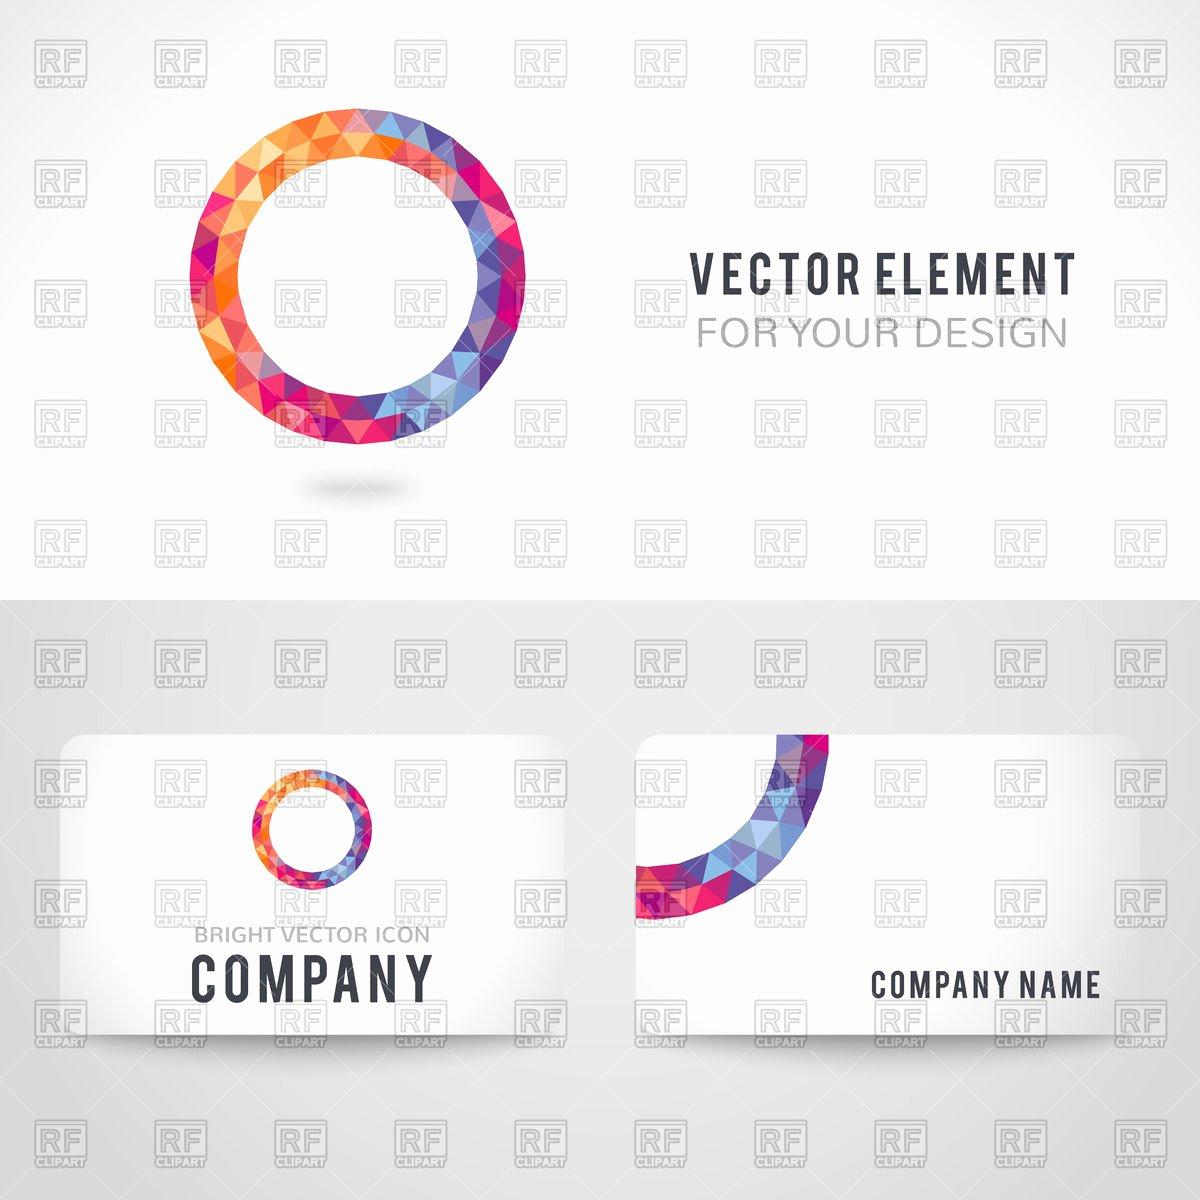 Business Cards Illustrator Template